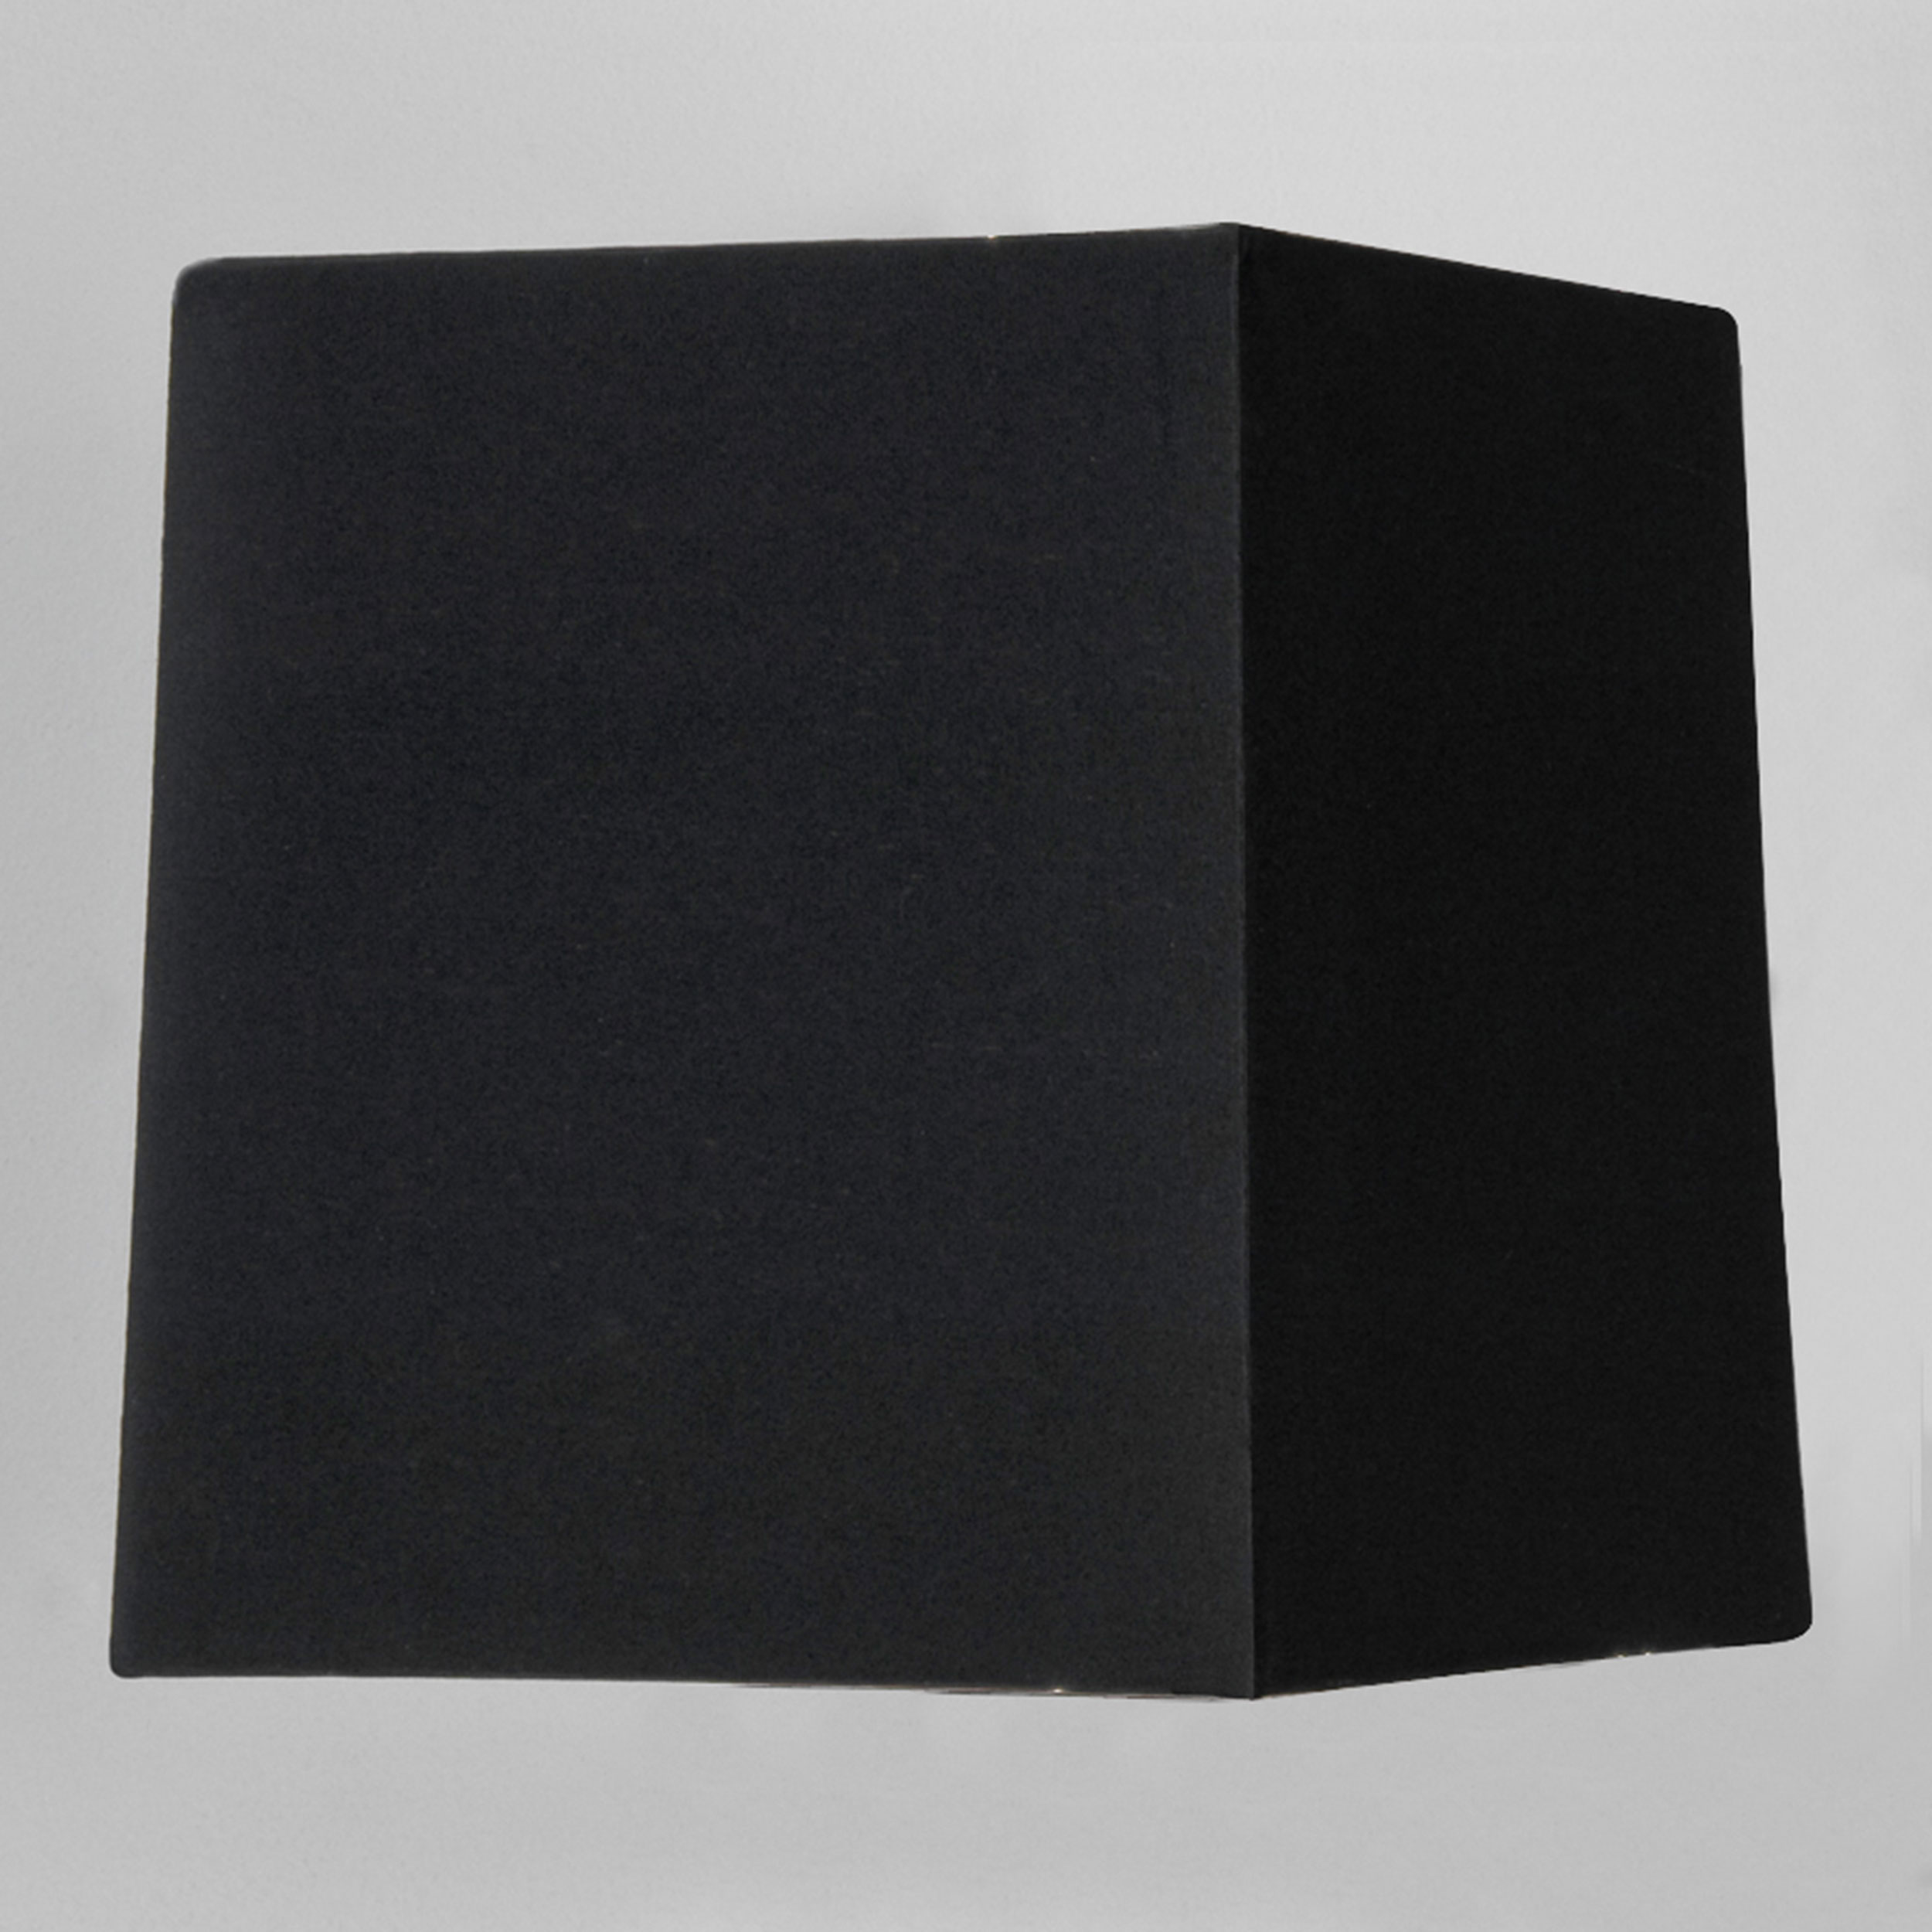 Абажур Astro Tapered Square 5003002 (4012), черный, текстиль - фото 1